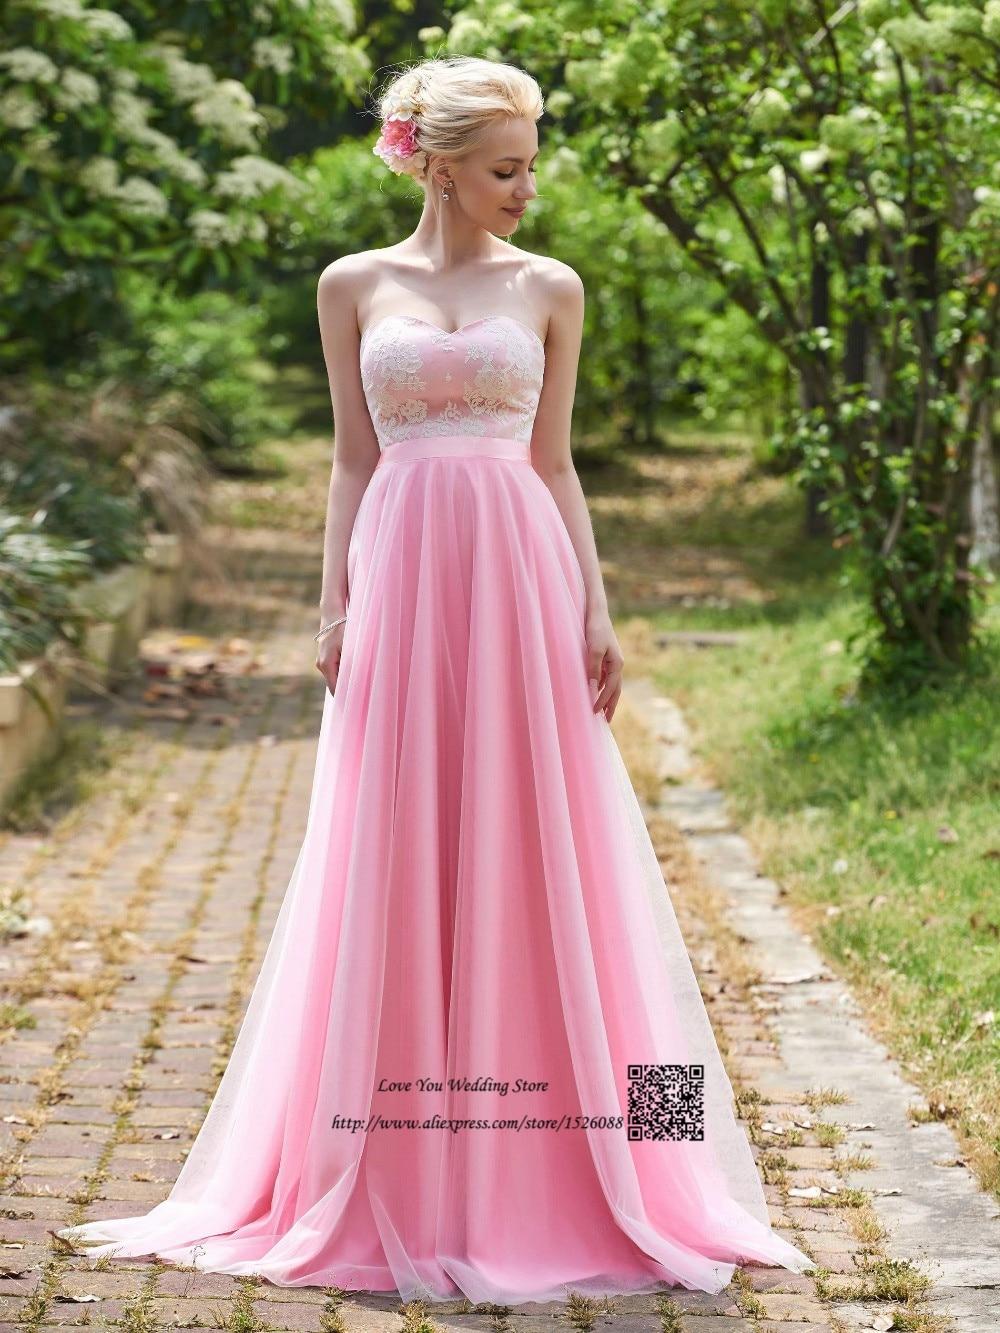 Hermosa Prom Vestidos En Monroe La Motivo - Ideas de Estilos de ...